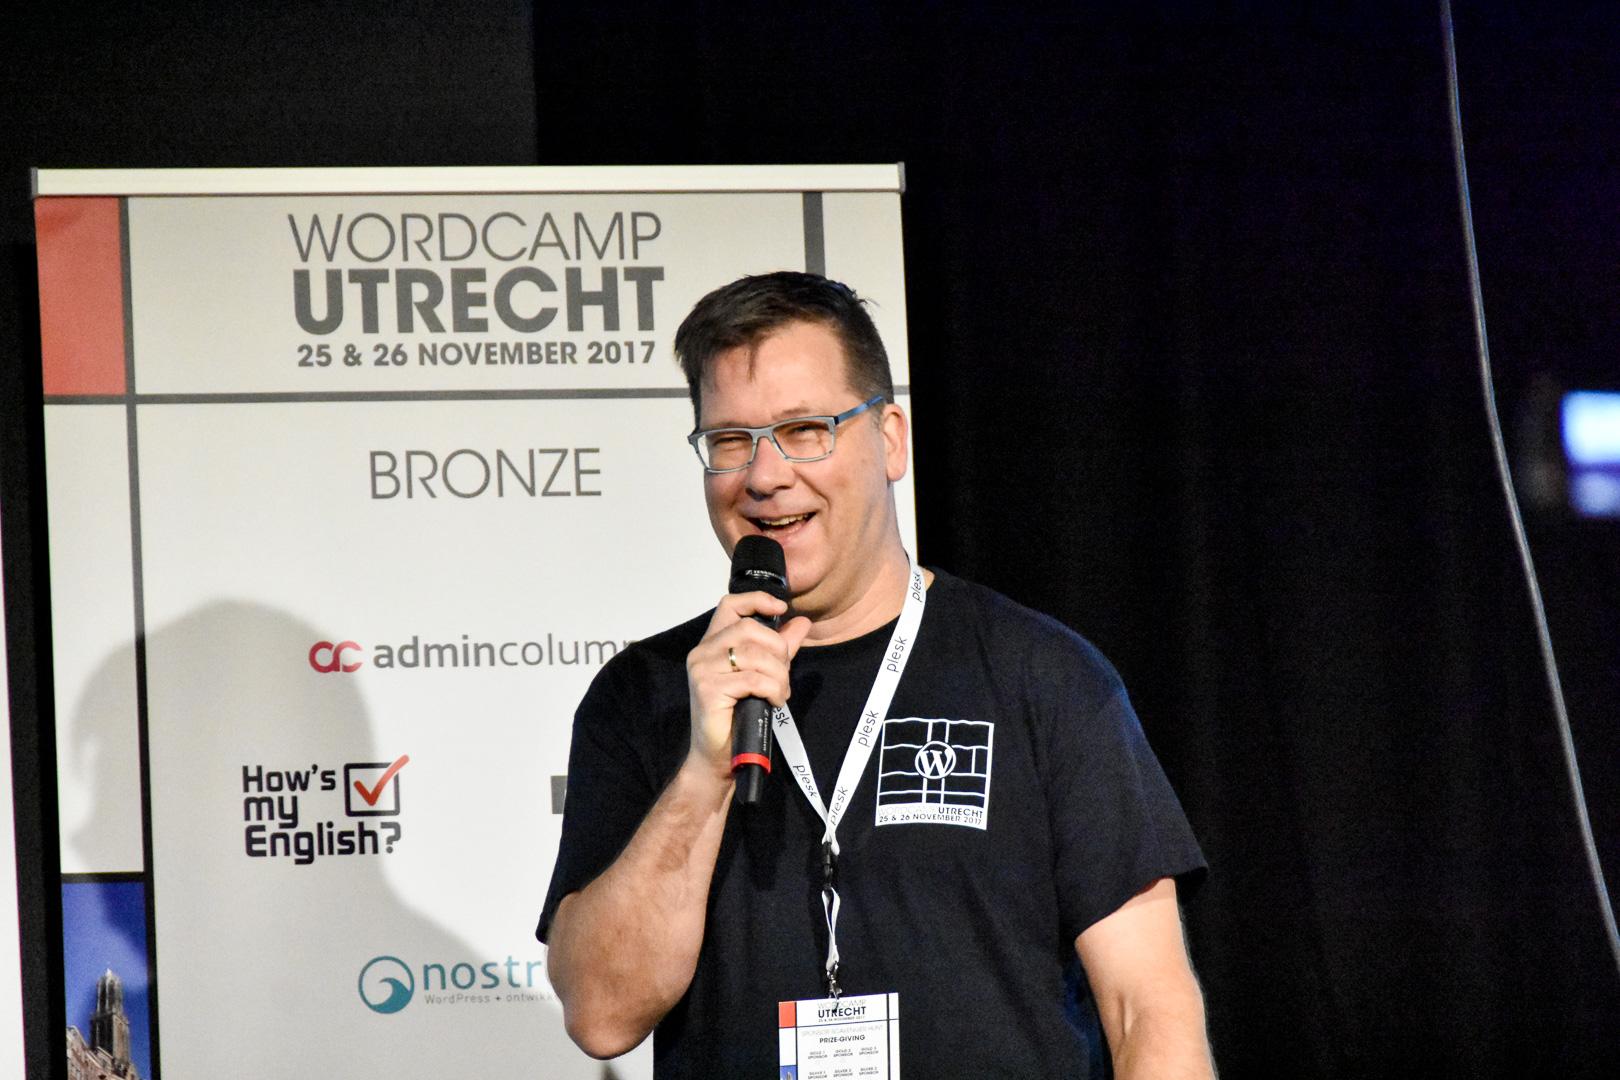 WordCamp Utrecht, Sjoerd Blom, opening remarks